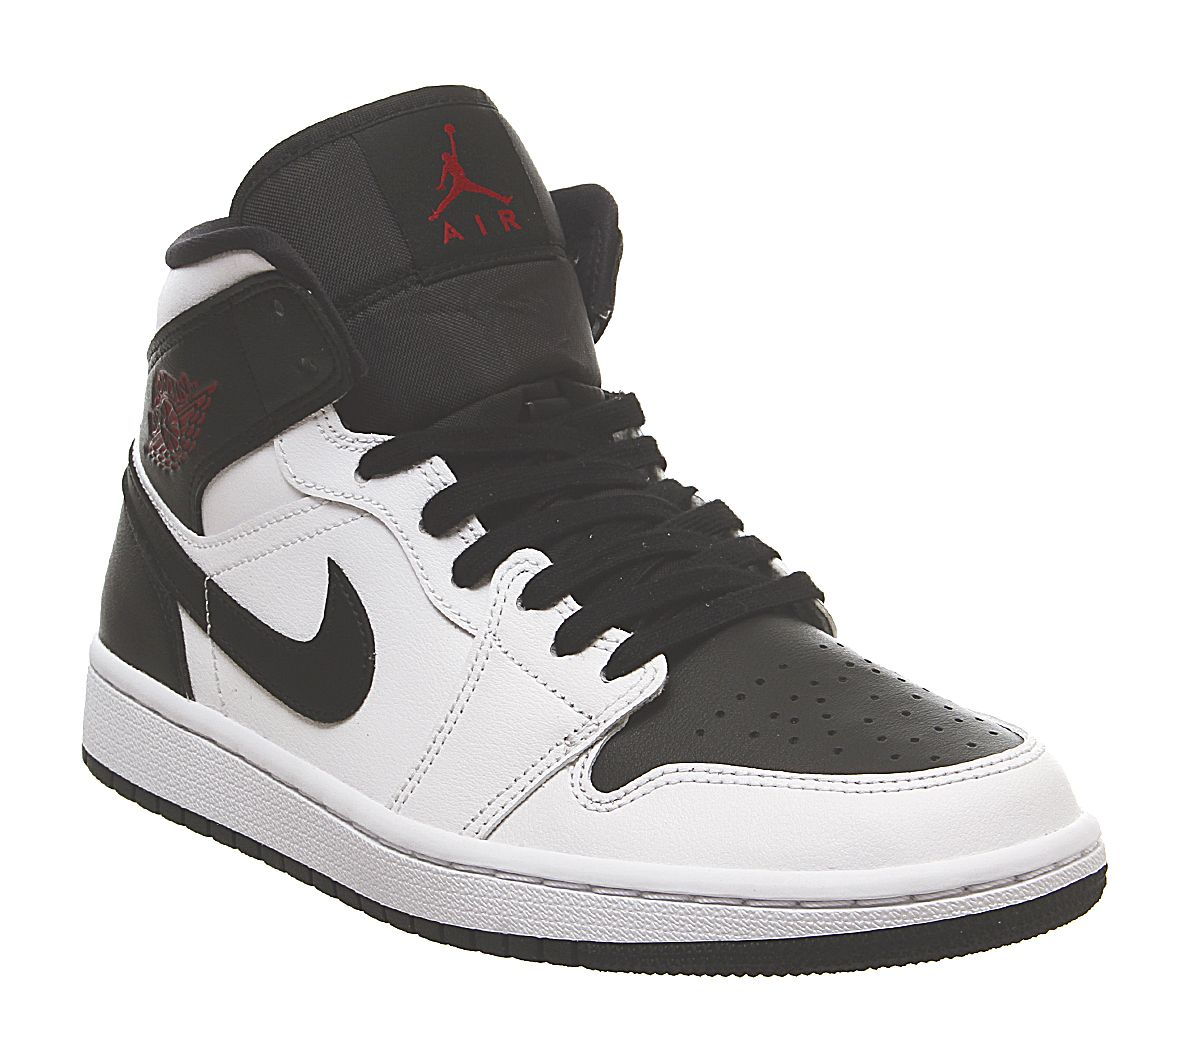 new style 2d4a2 63b5a Jordan Air Jordan 1 Mid Trainers White Gym Red Black F - His ...